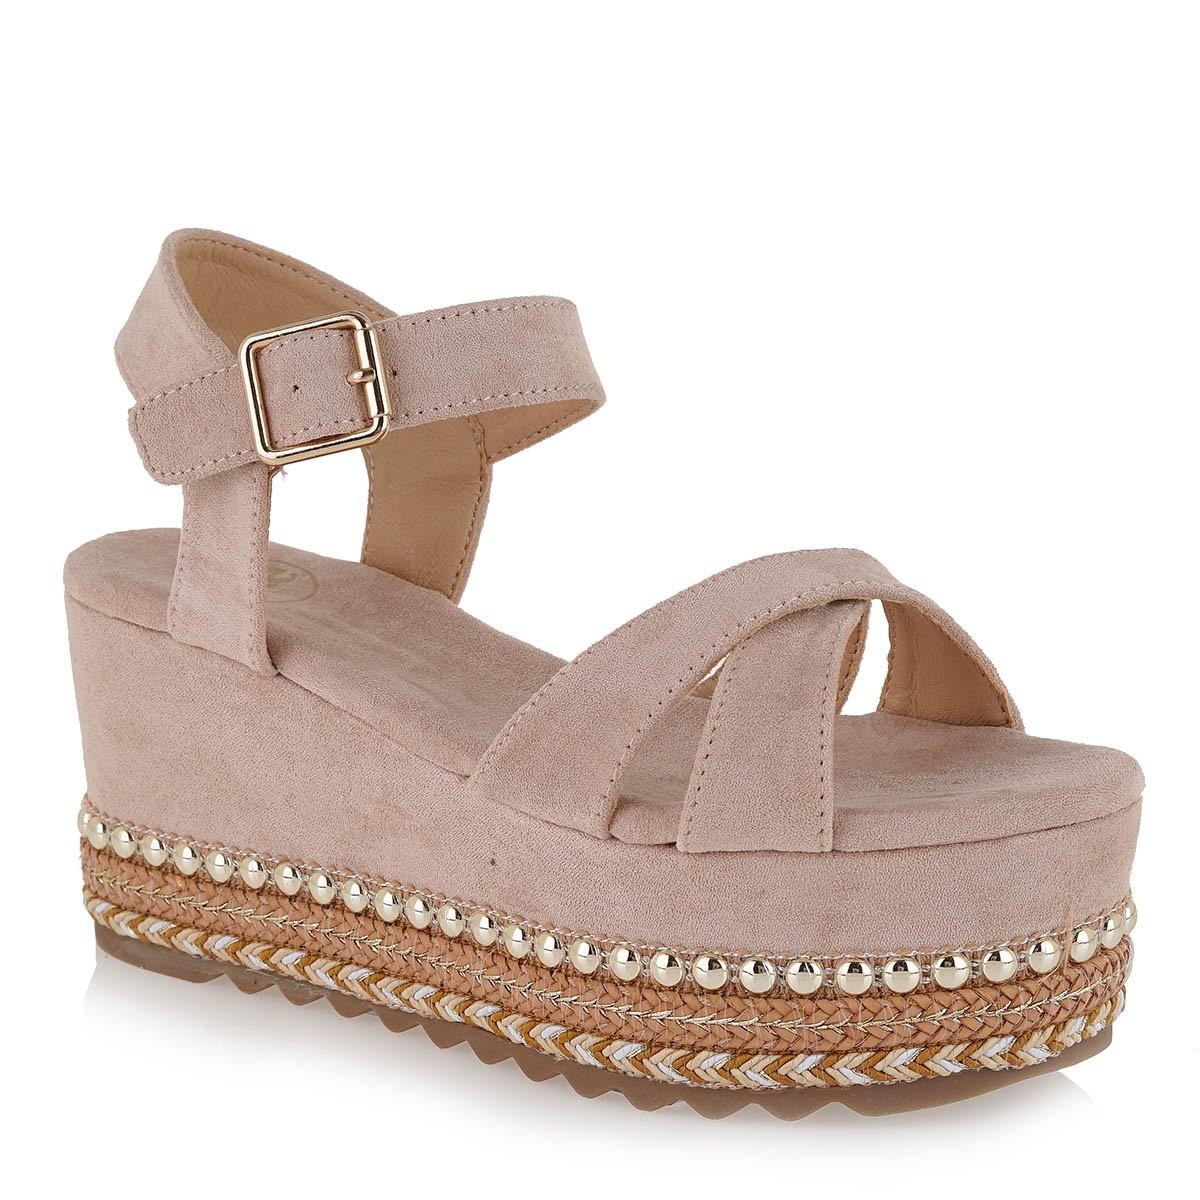 EXE Shoes Γυναικεία Πέδιλα Πλατφόρμες MACAU-716 Nude Ι4700716771